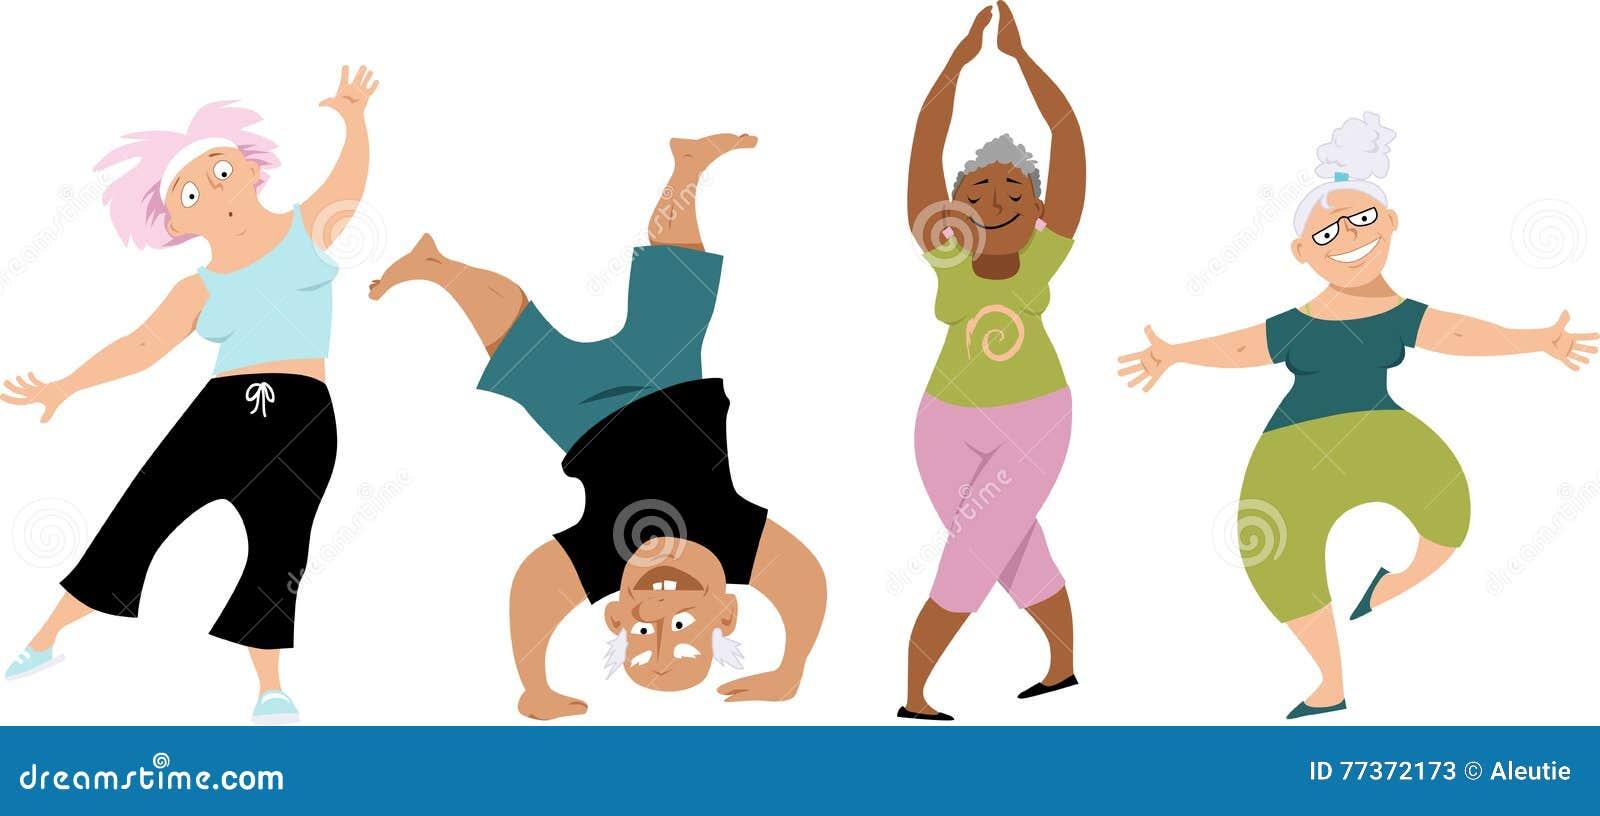 Cartoon Characters Exercising : Senior yoga stock vector illustration of gymnastics